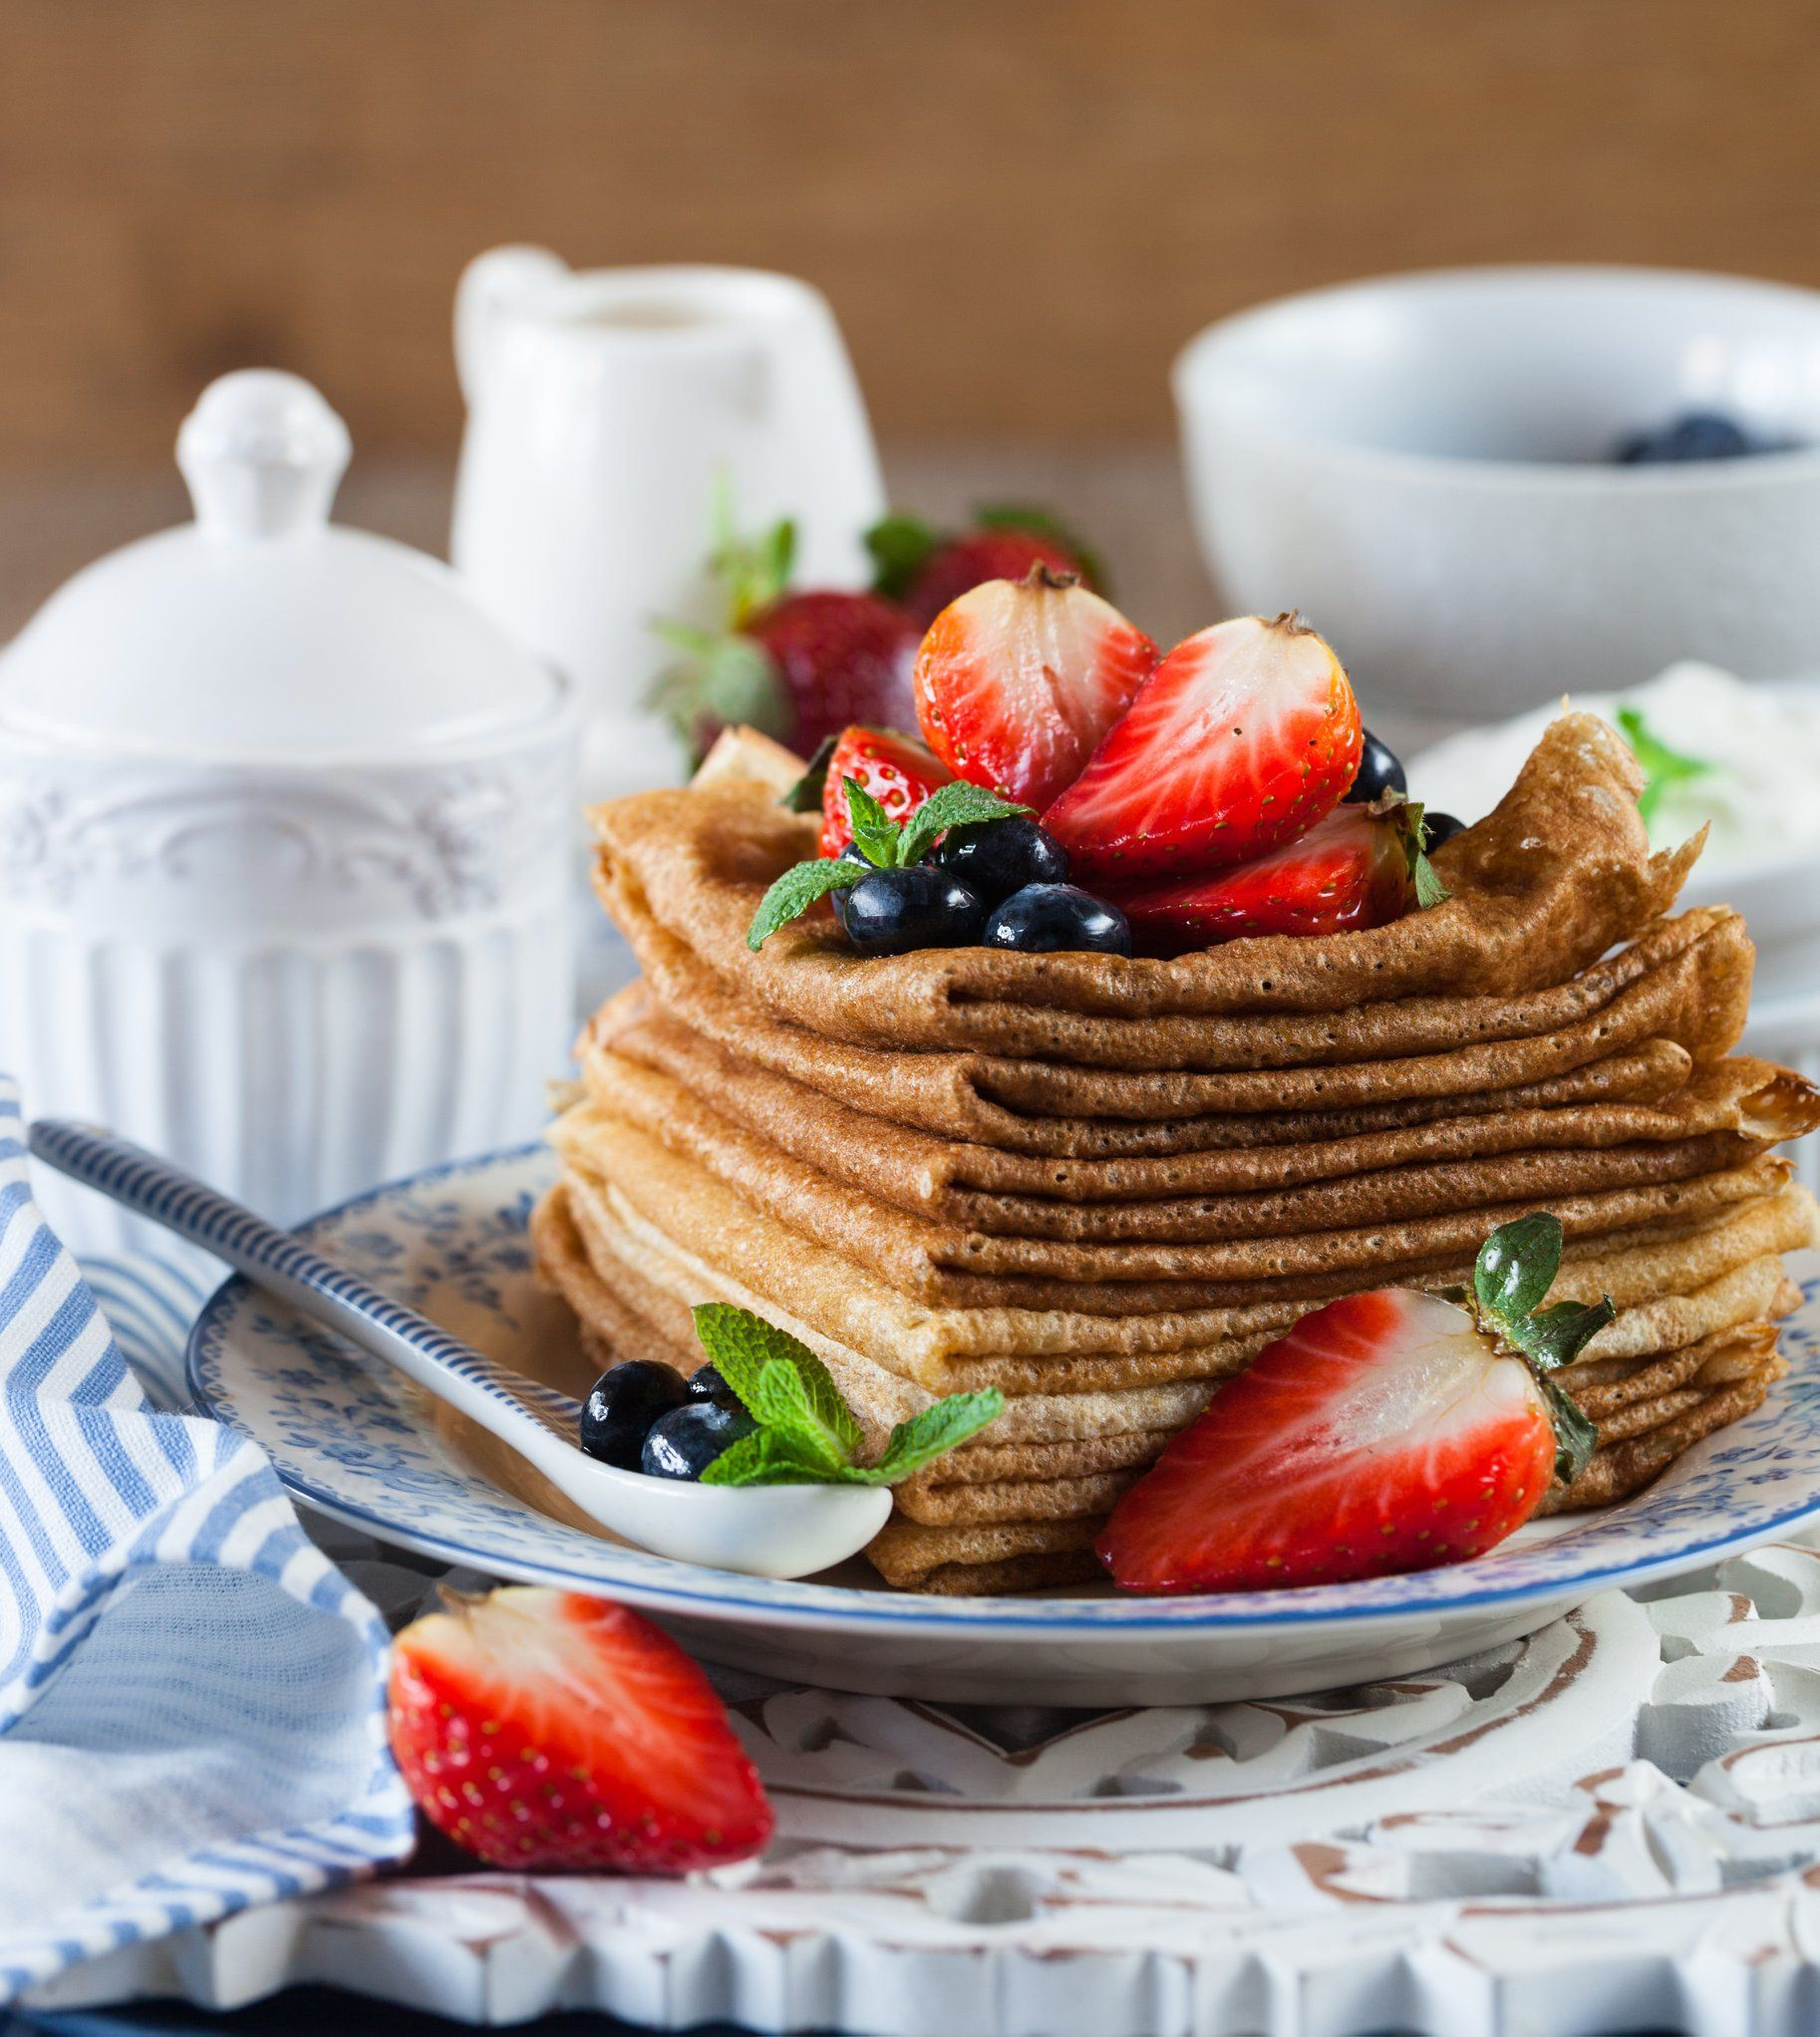 Shrovetide days: Wednesday - gourmet 25